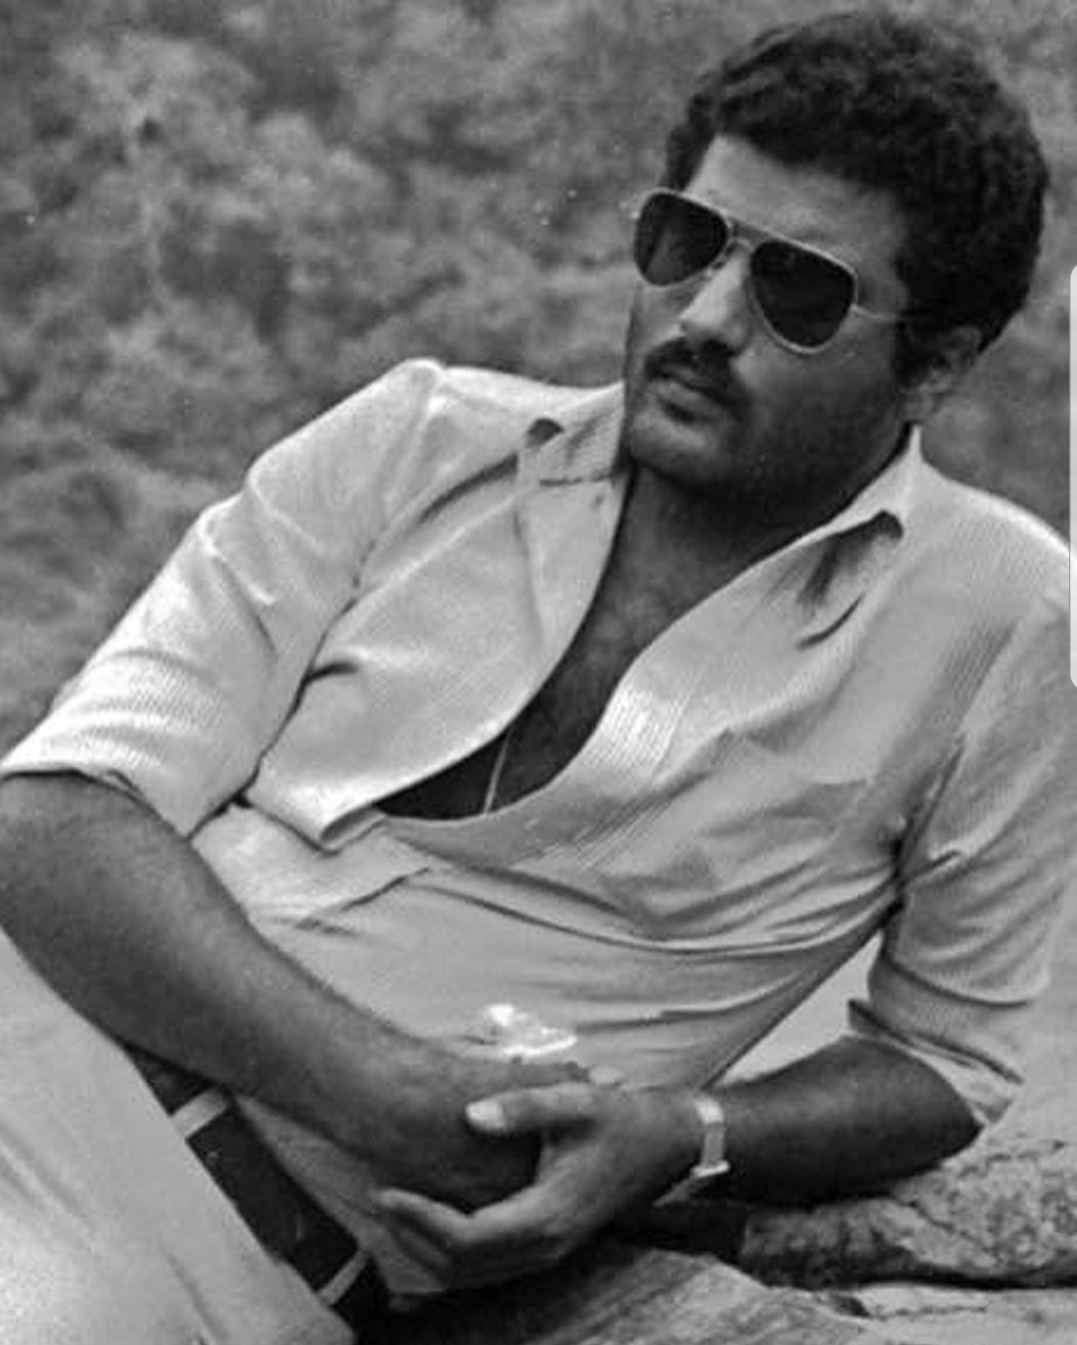 Boney Kapoor young